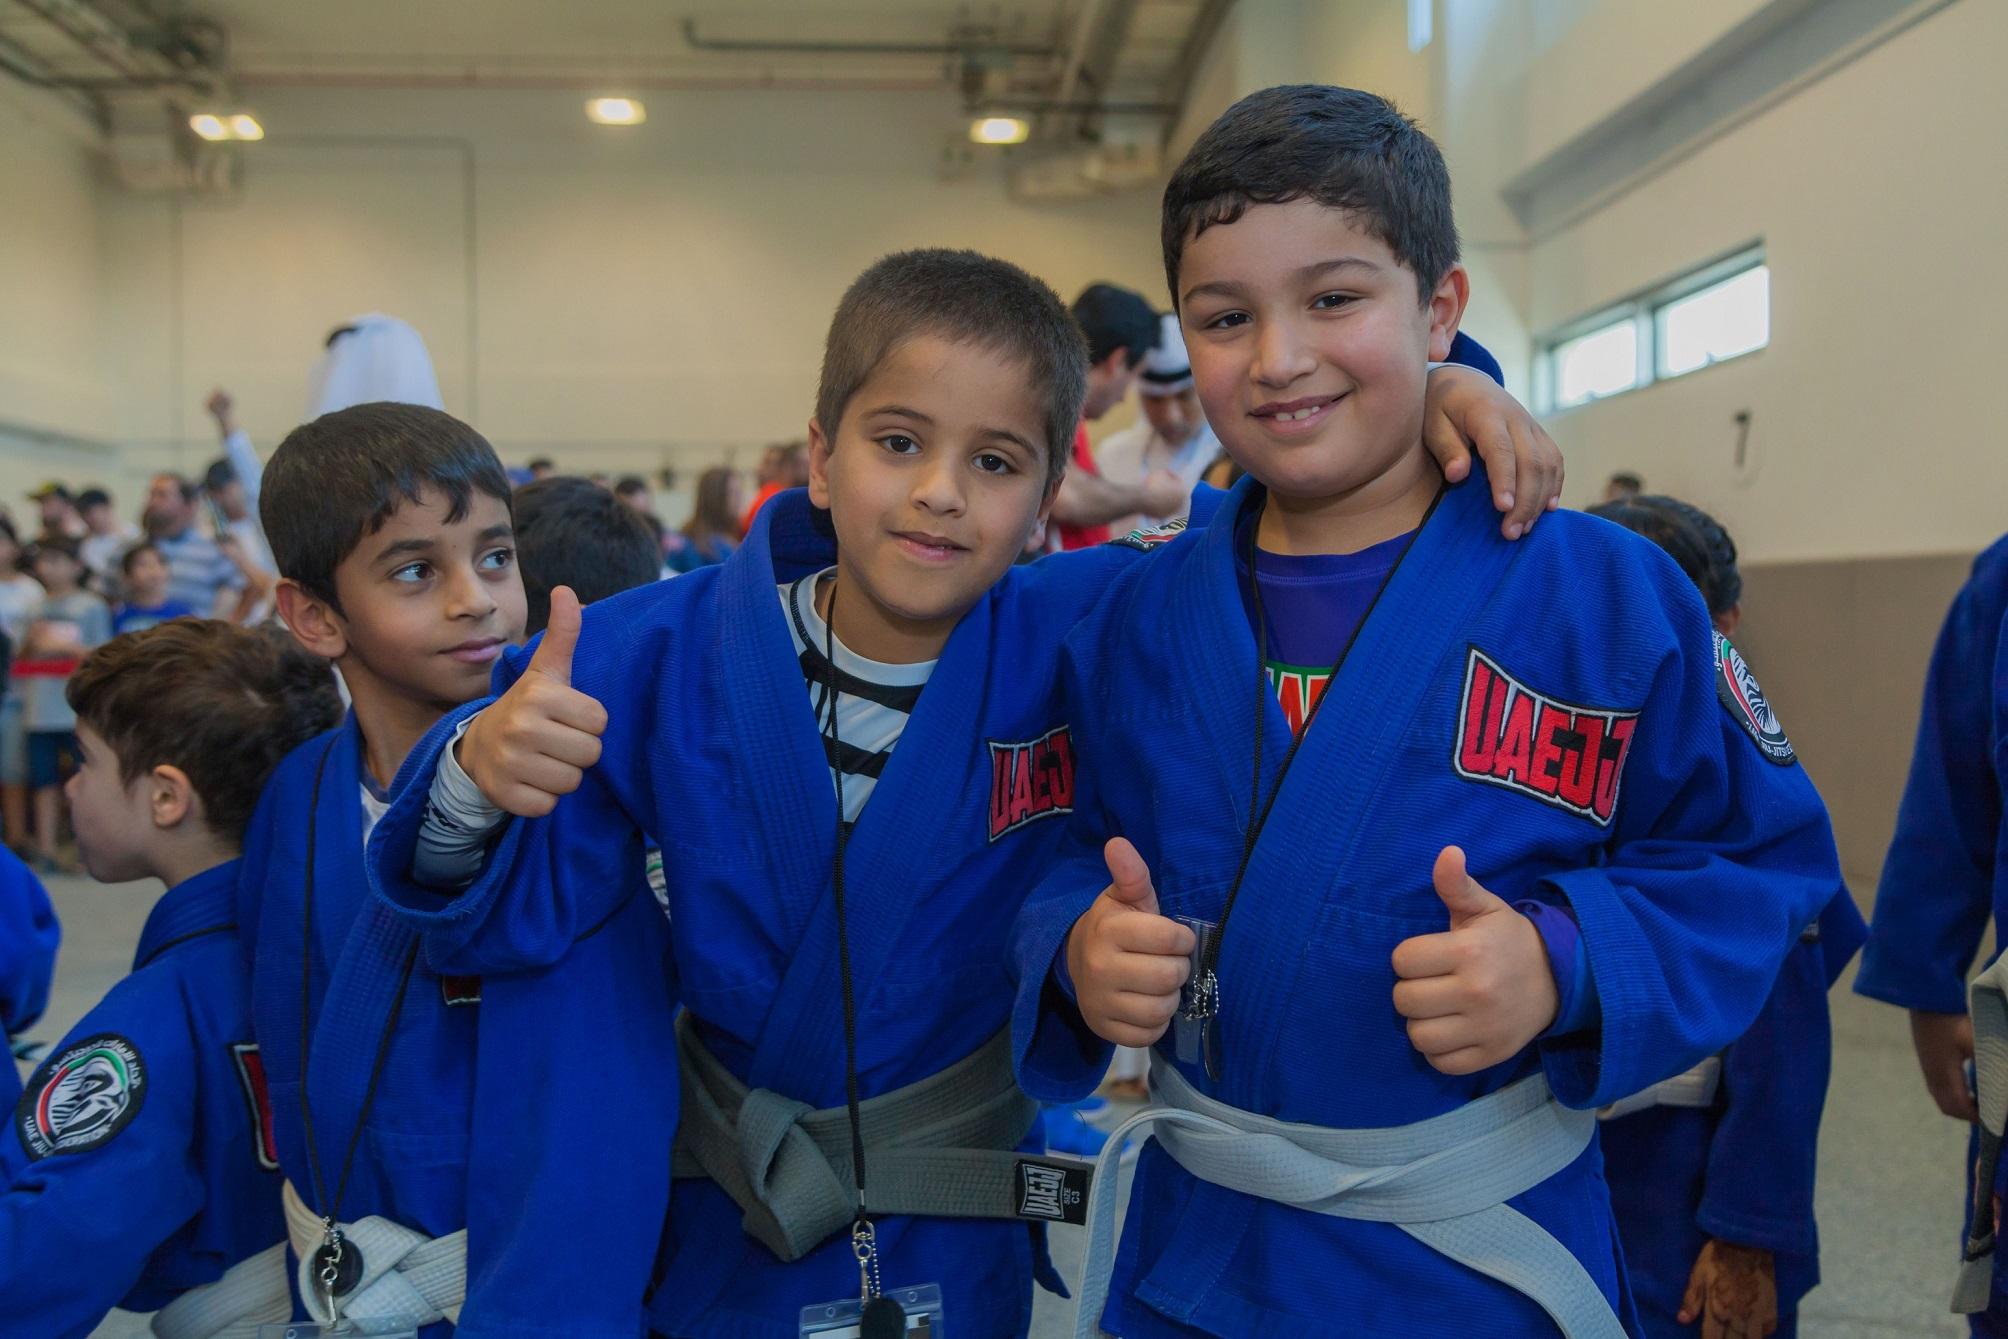 abu dhabi world professional jiu-jitsu championship shows jiu-jitsu is a sport for all 9.jpg